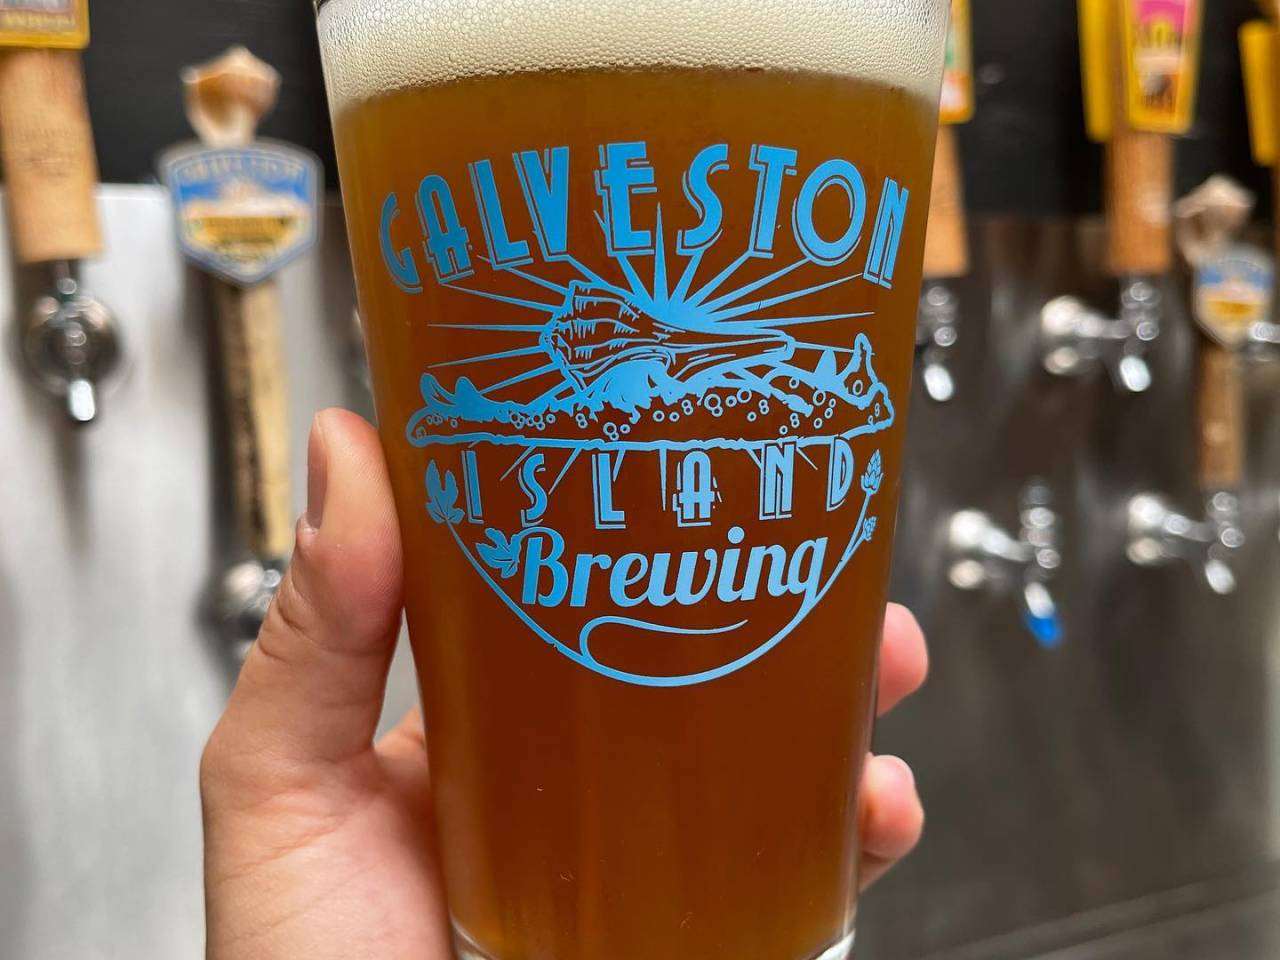 Galveston Island Brewing Co.